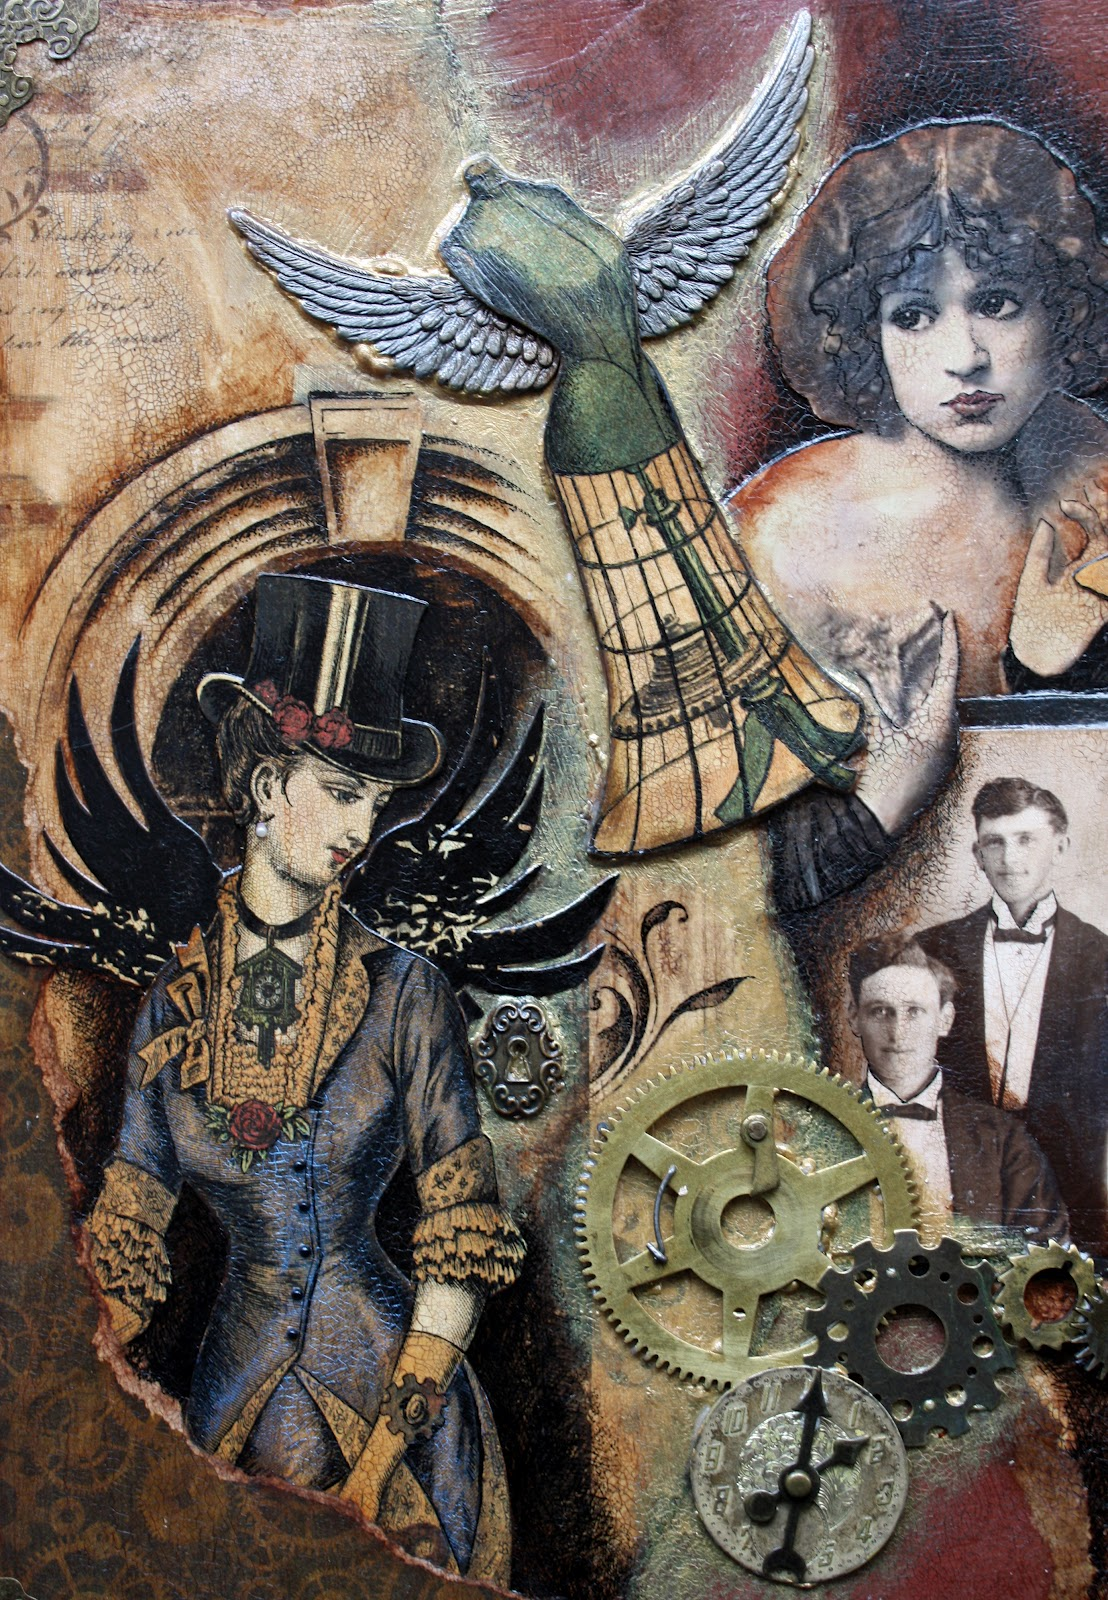 Victoria's Art Visions: Steampunk Art